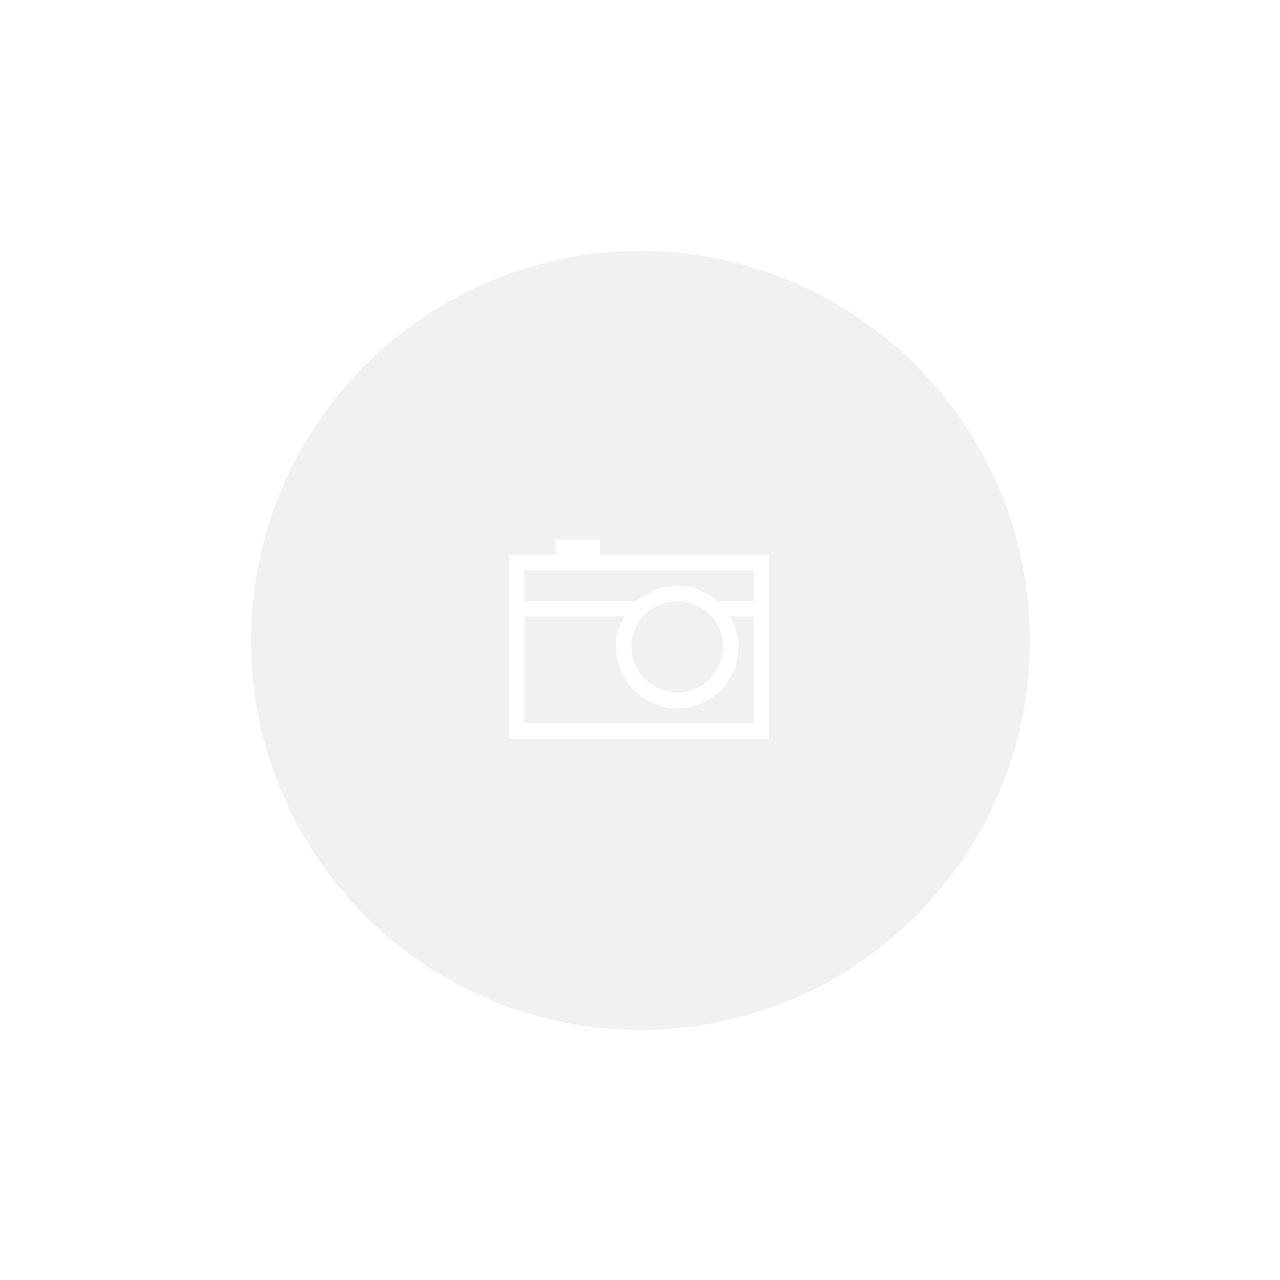 COMBO Máquina A6 Comfort + Jogo de Adaptador 10 Peças de Metal Oster